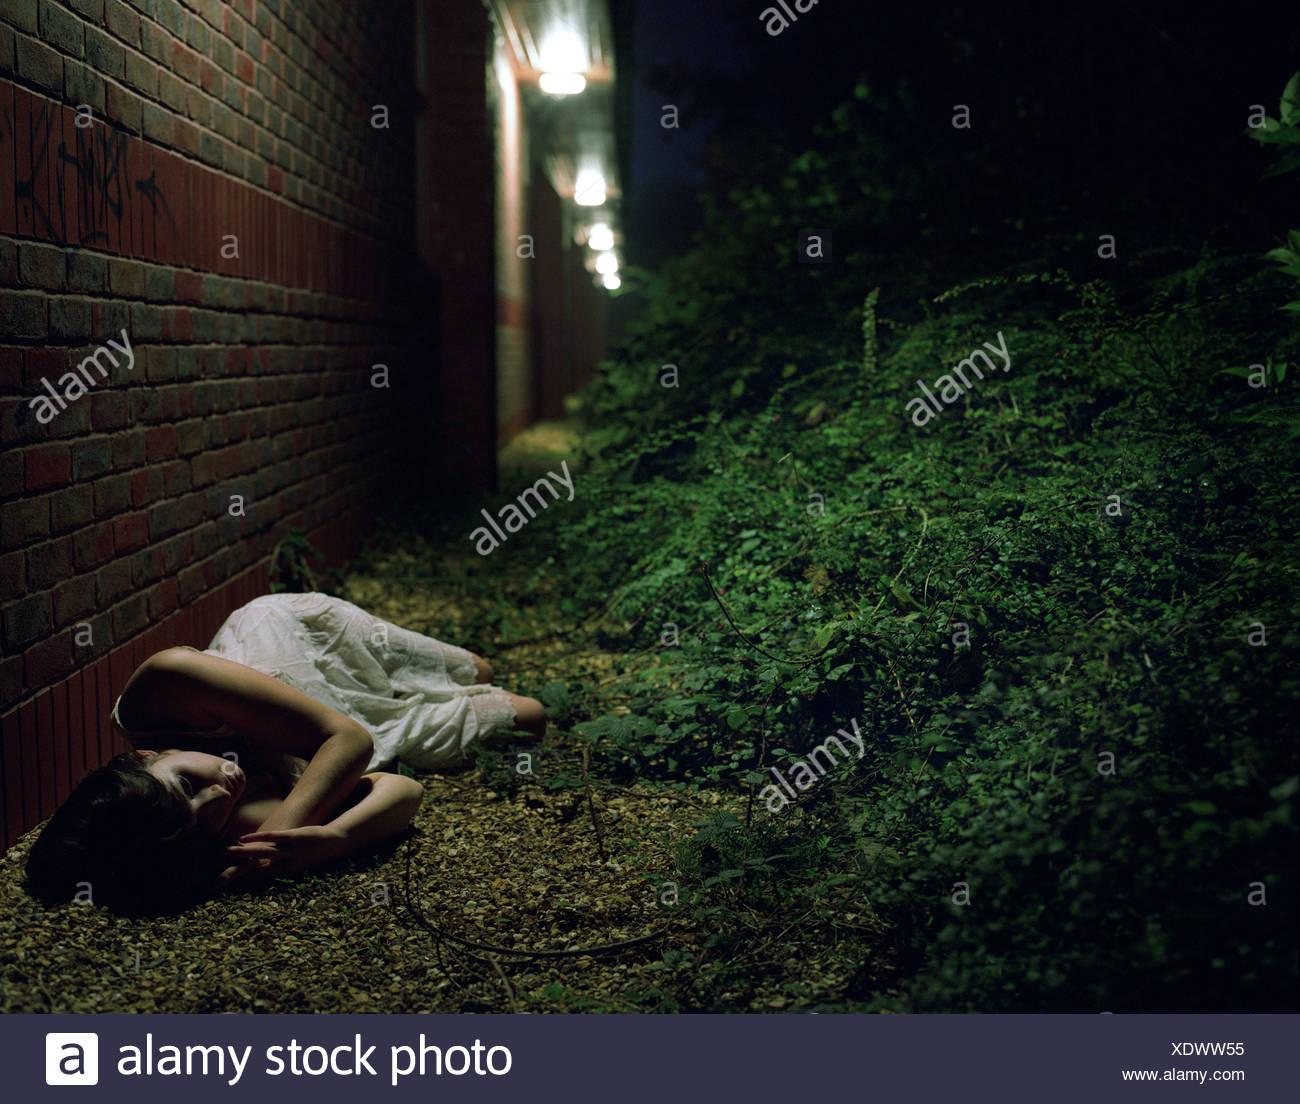 Woman lying by brick wall at night - Stock Image